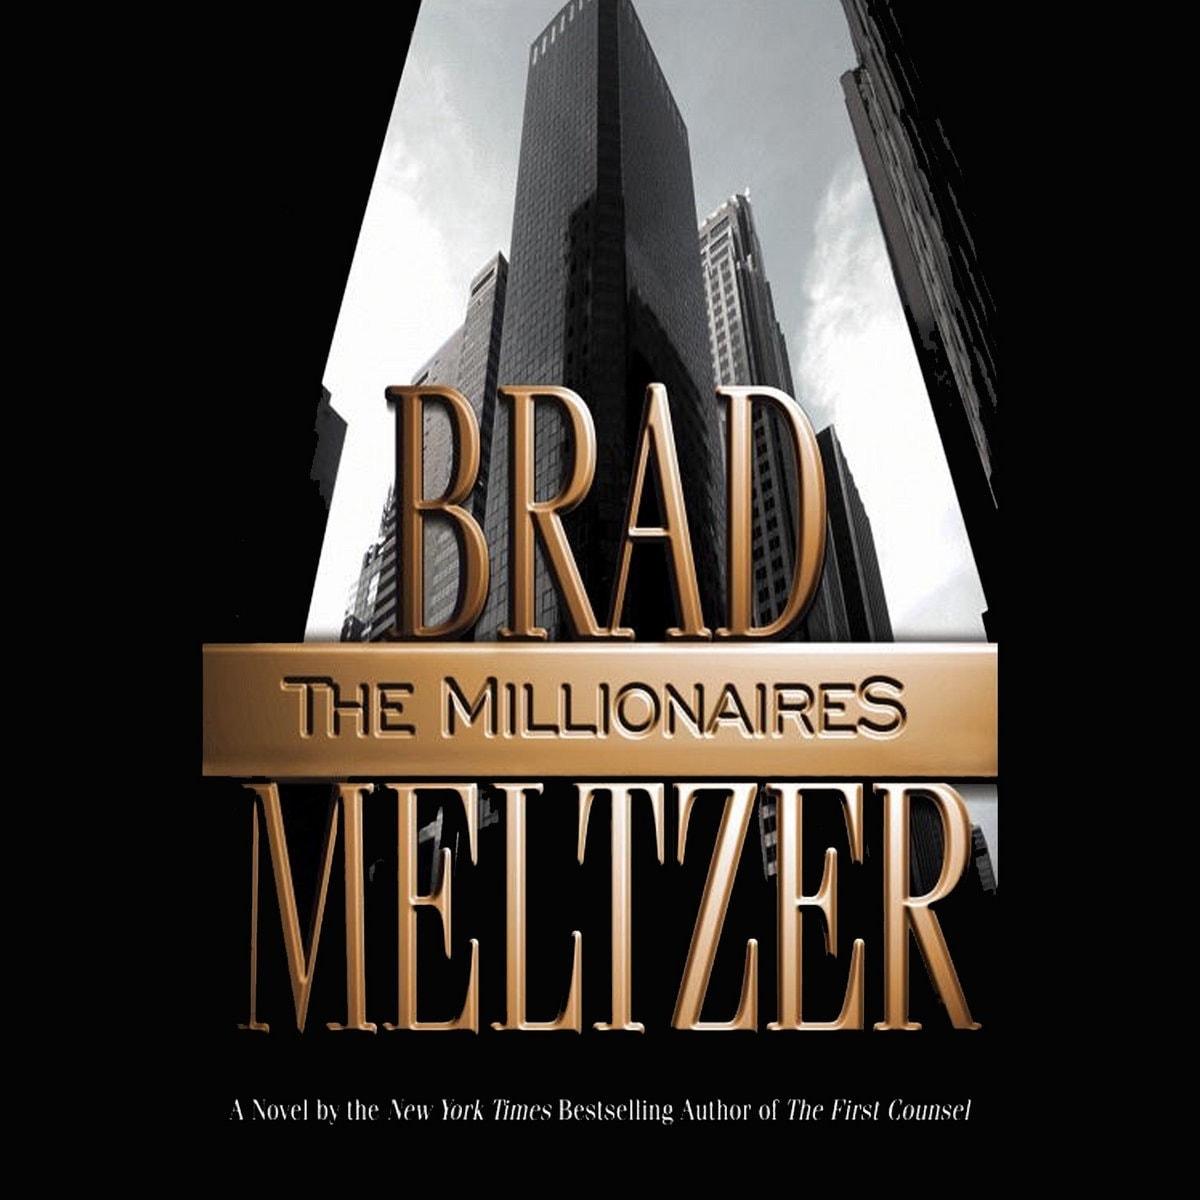 The Millionaires _ BRAD MELTZER